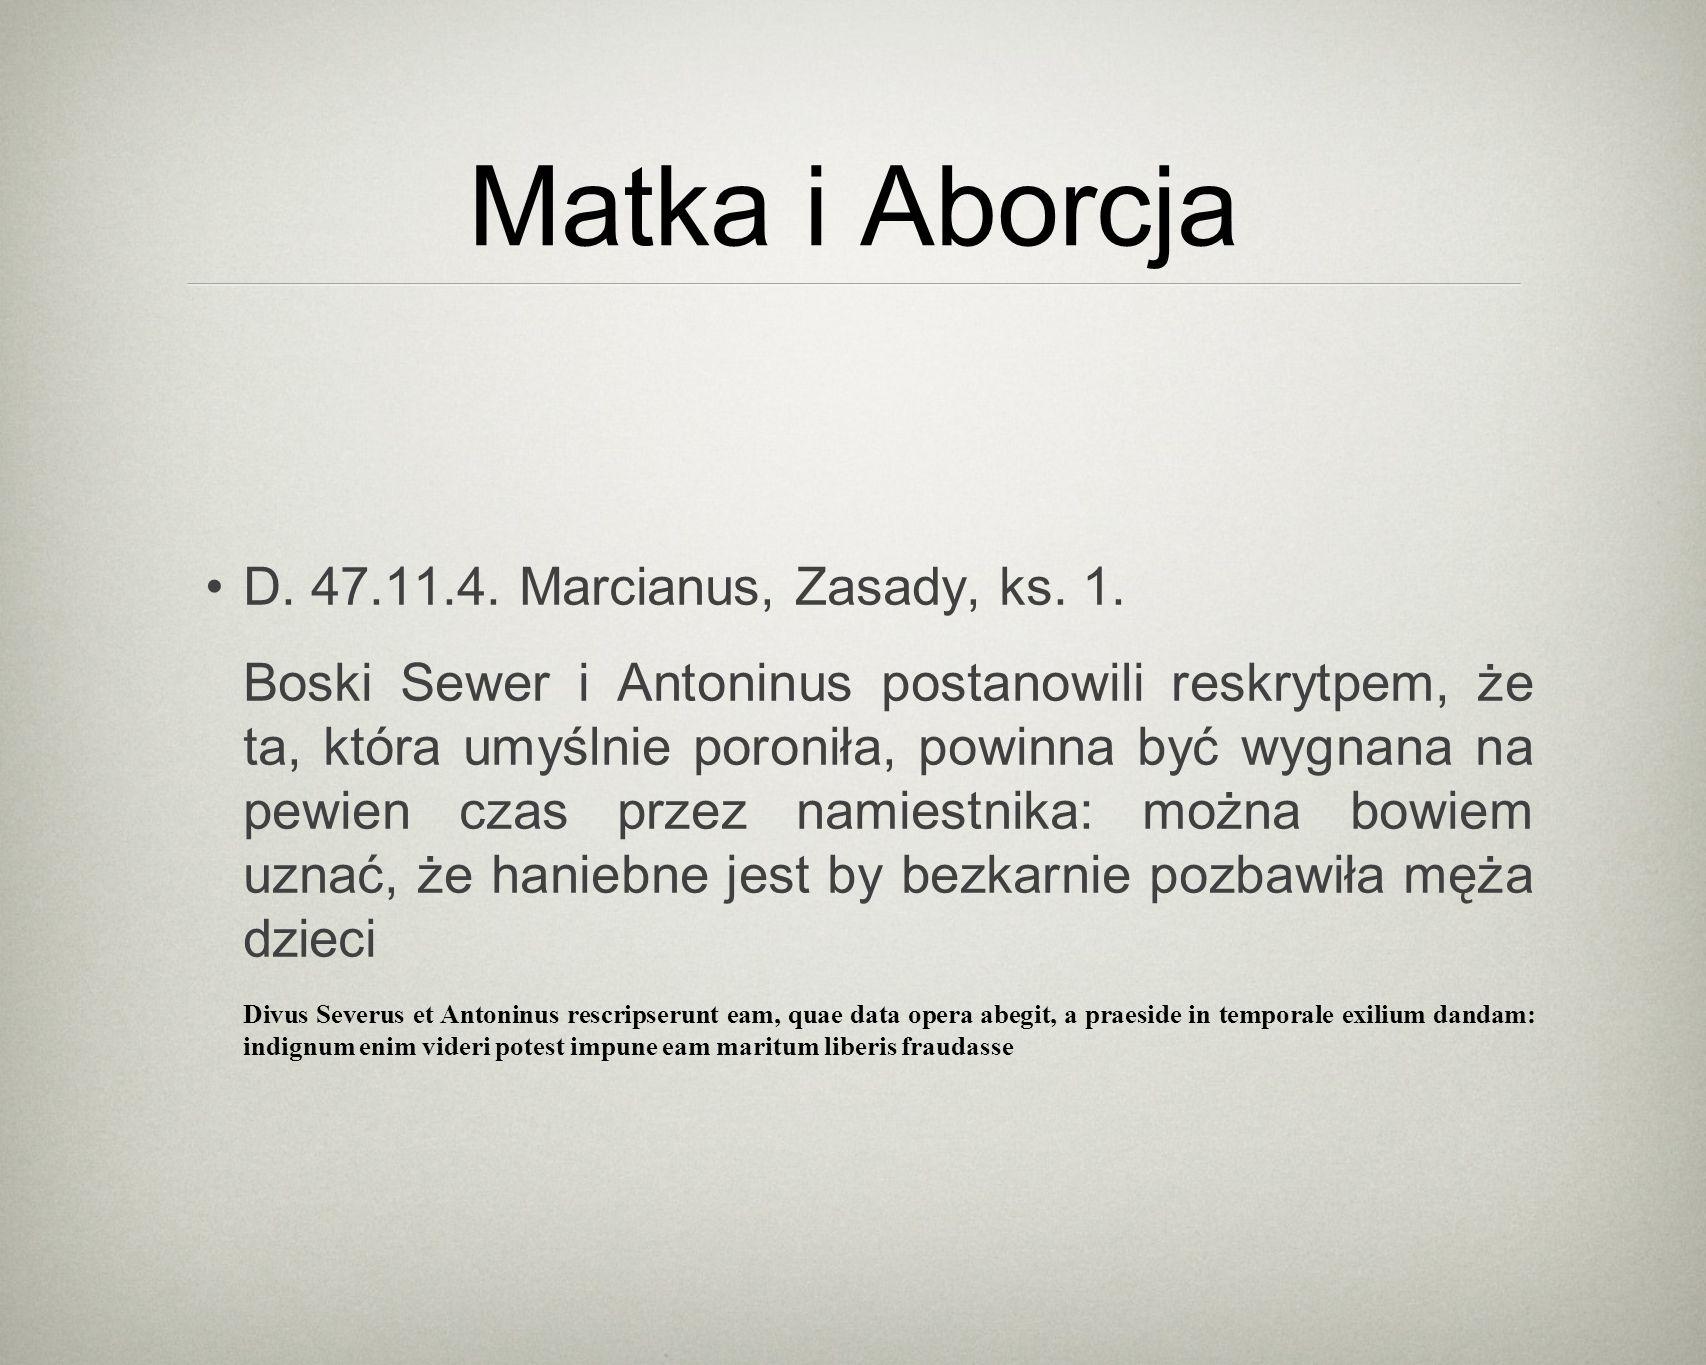 Matka i Aborcja D. 47.11.4. Marcianus, Zasady, ks.